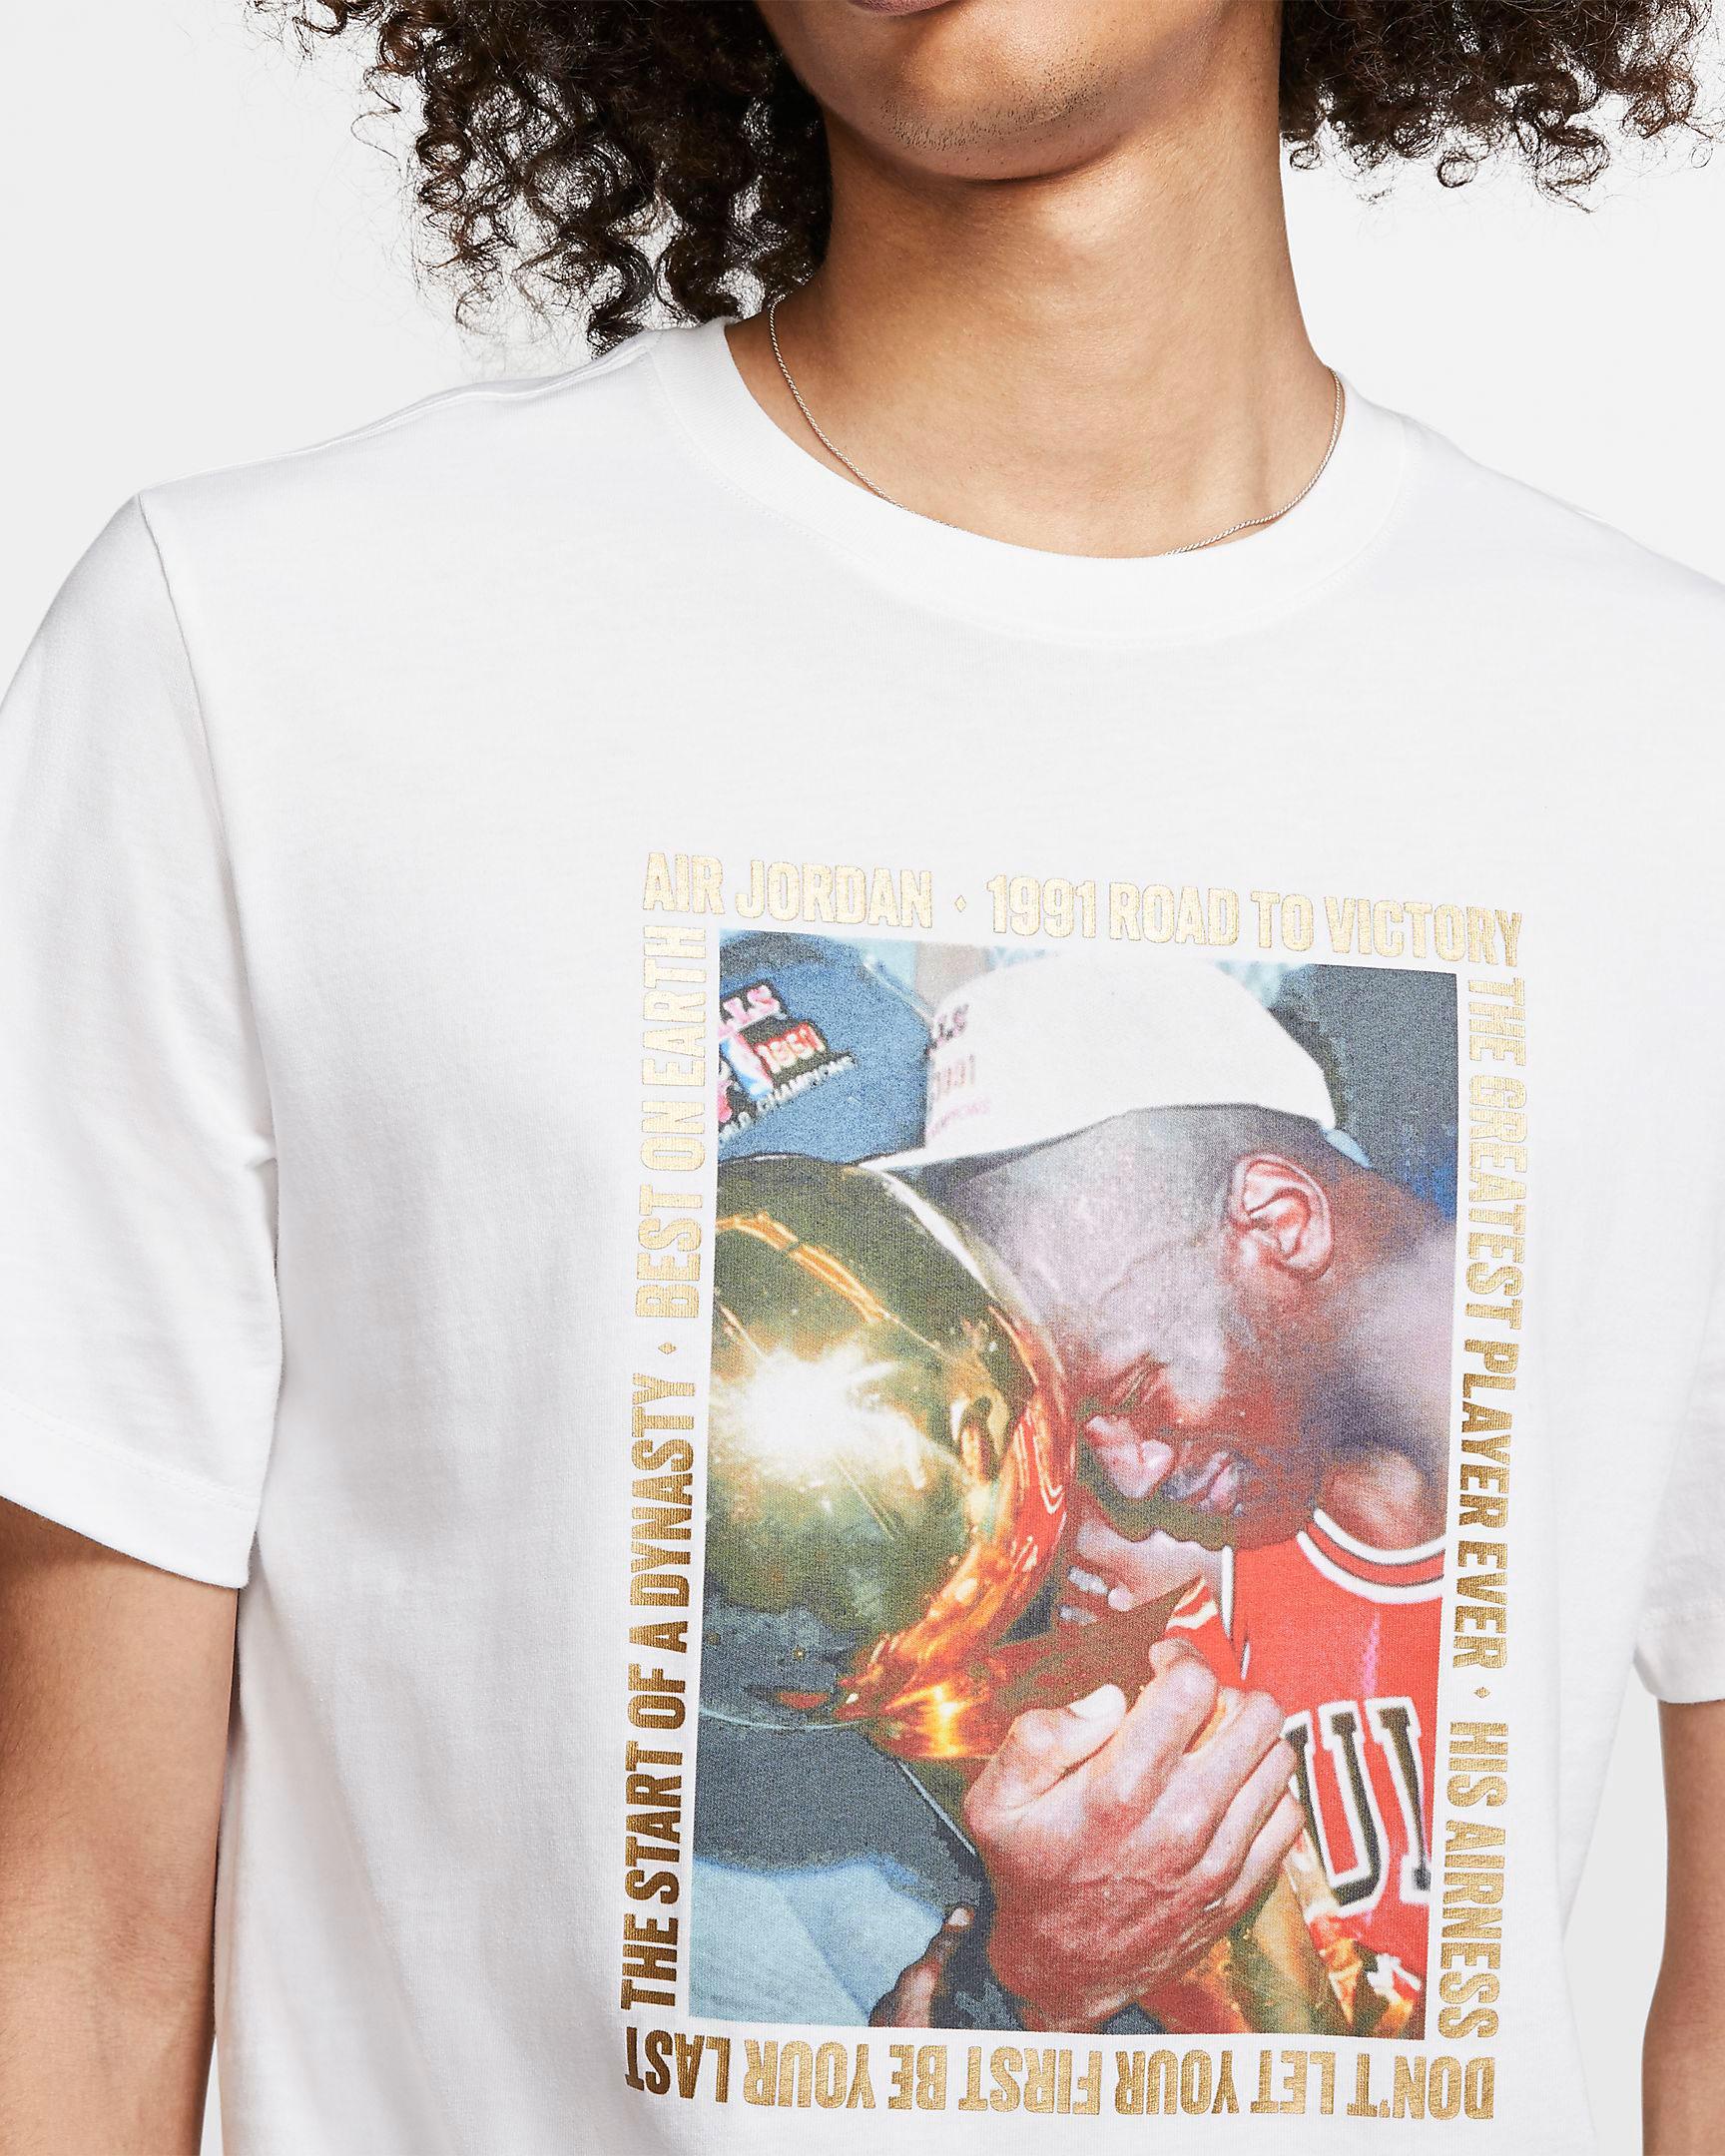 air-jordan-reflections-of-a-champion-tee-shirt-1